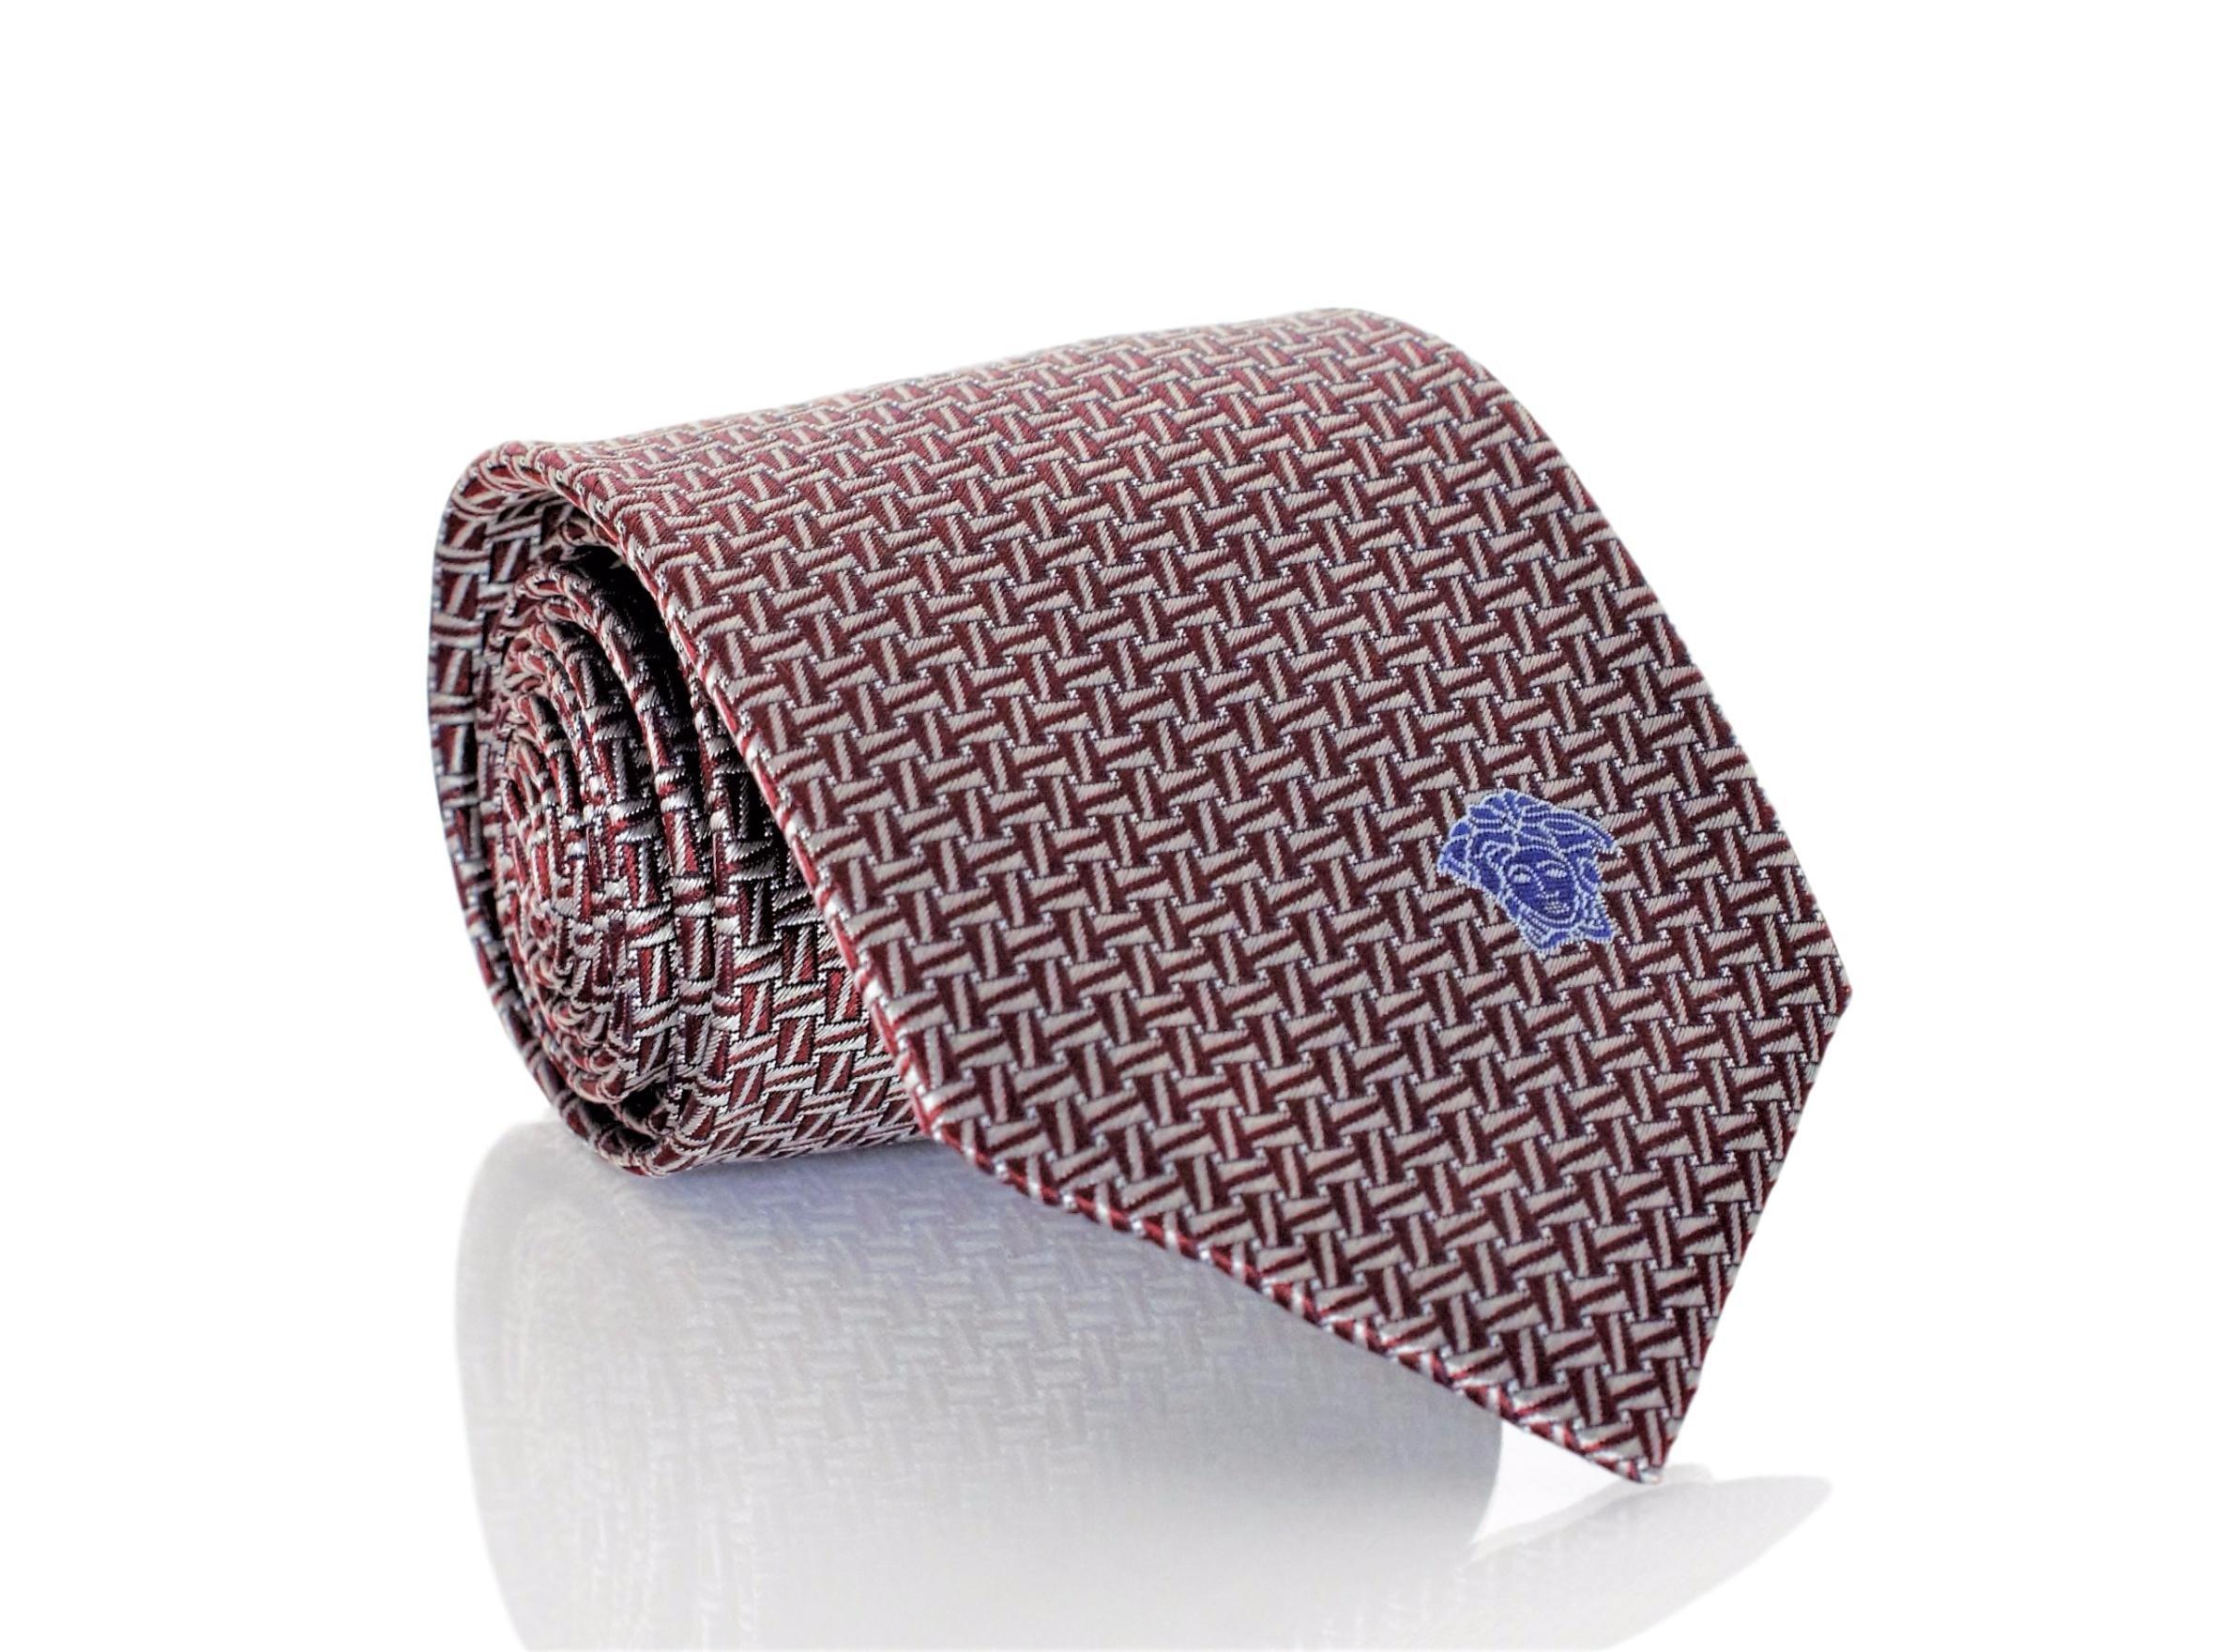 Versace Men's Dizzy Rectangles Woven Silk Necktie Burgundy-SIlver